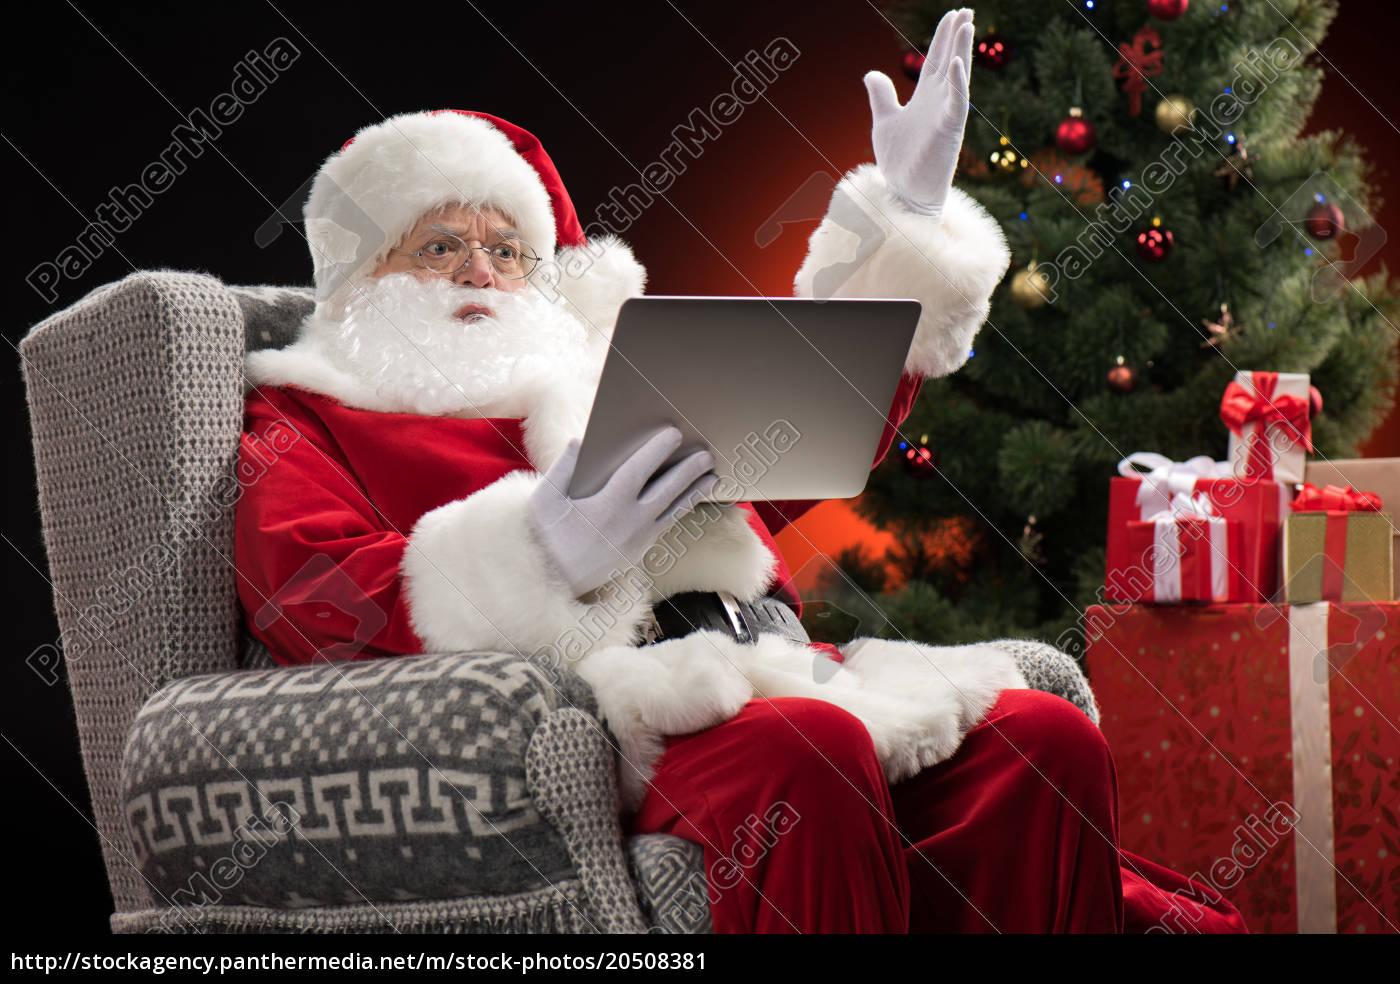 santa, claus, using, laptop, and, gesturing - 20508381